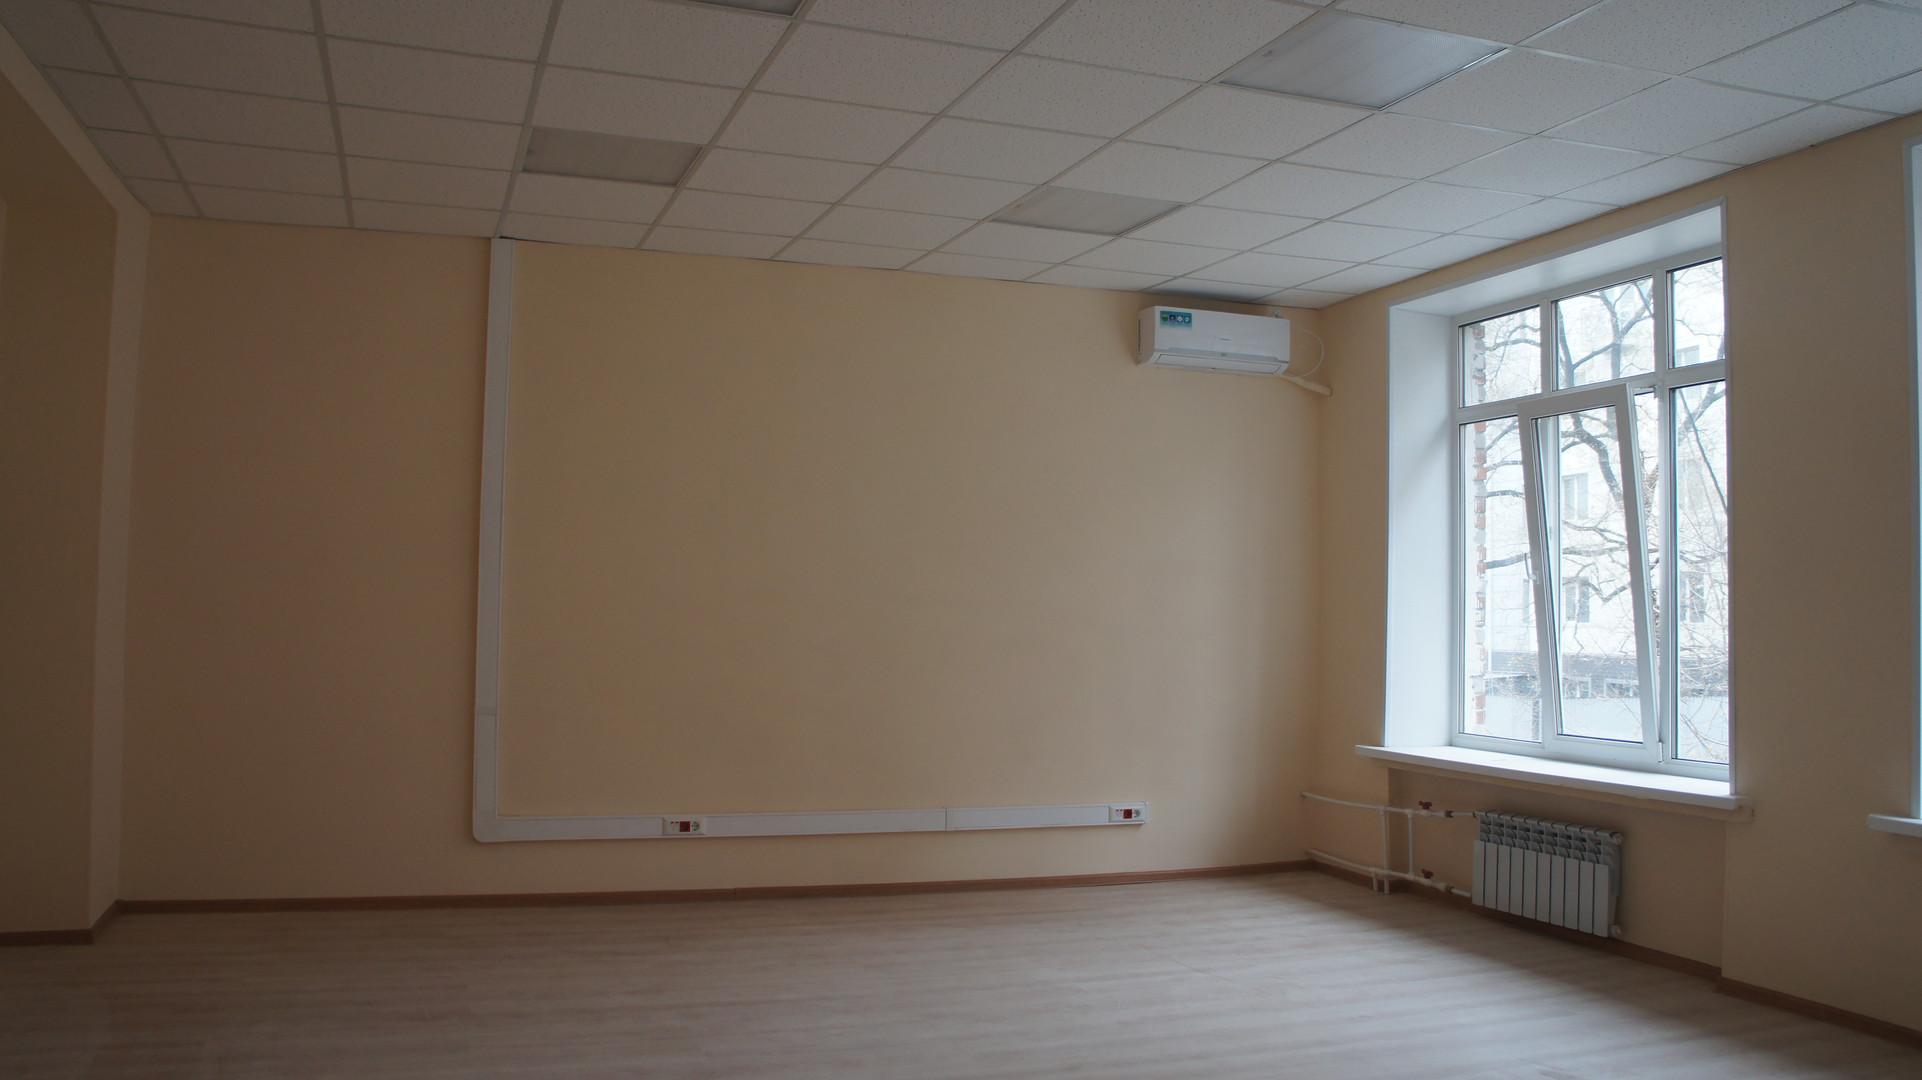 Ремонт офиса во владивостоке, крастоун в